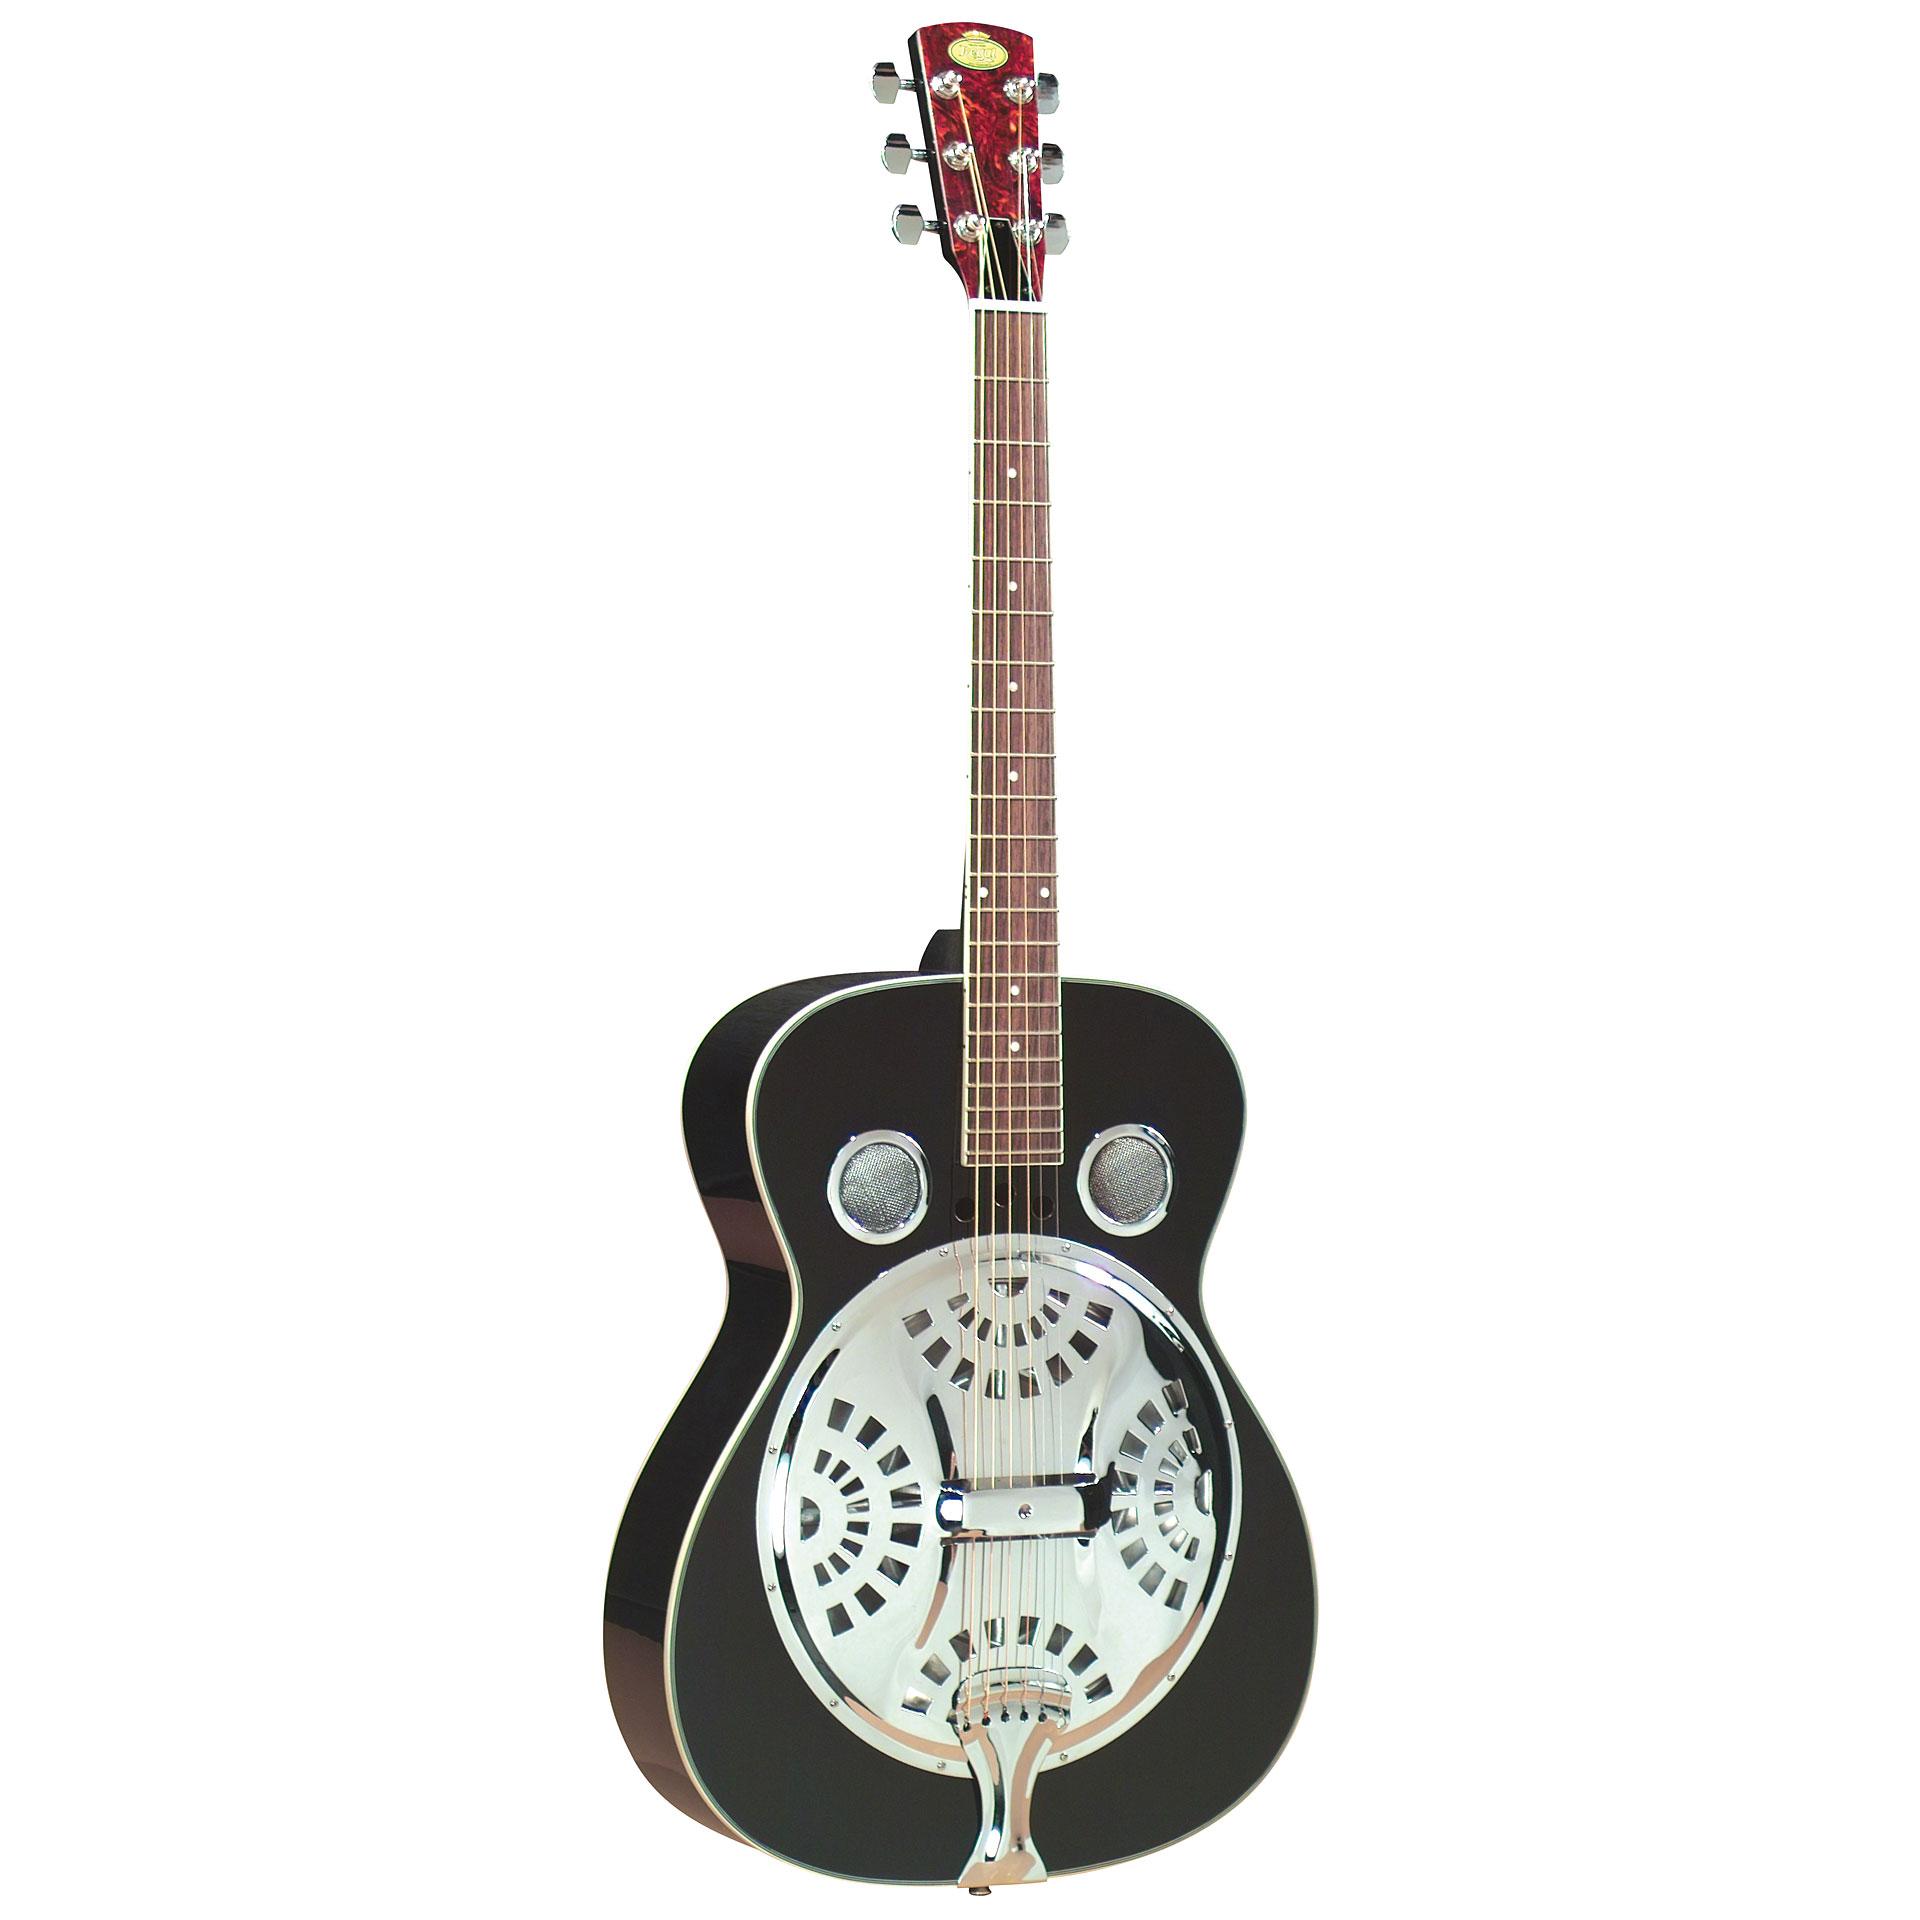 regal guitars rd 30b dobro resonator dobro resonator. Black Bedroom Furniture Sets. Home Design Ideas